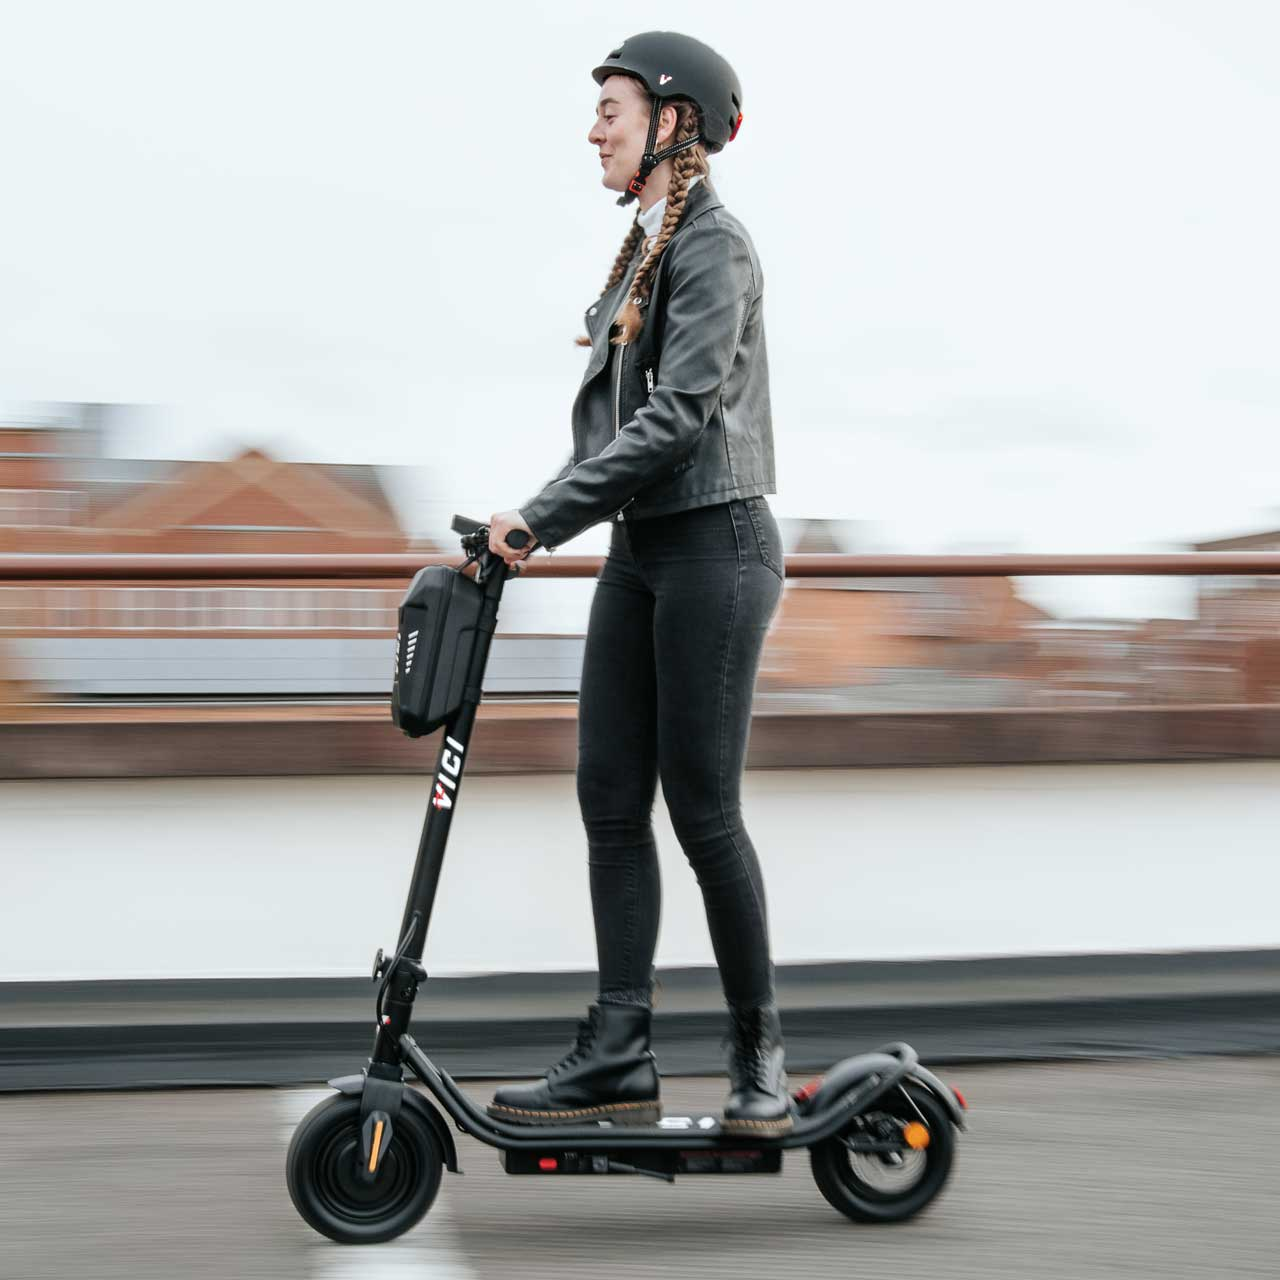 Riding an e-scooter